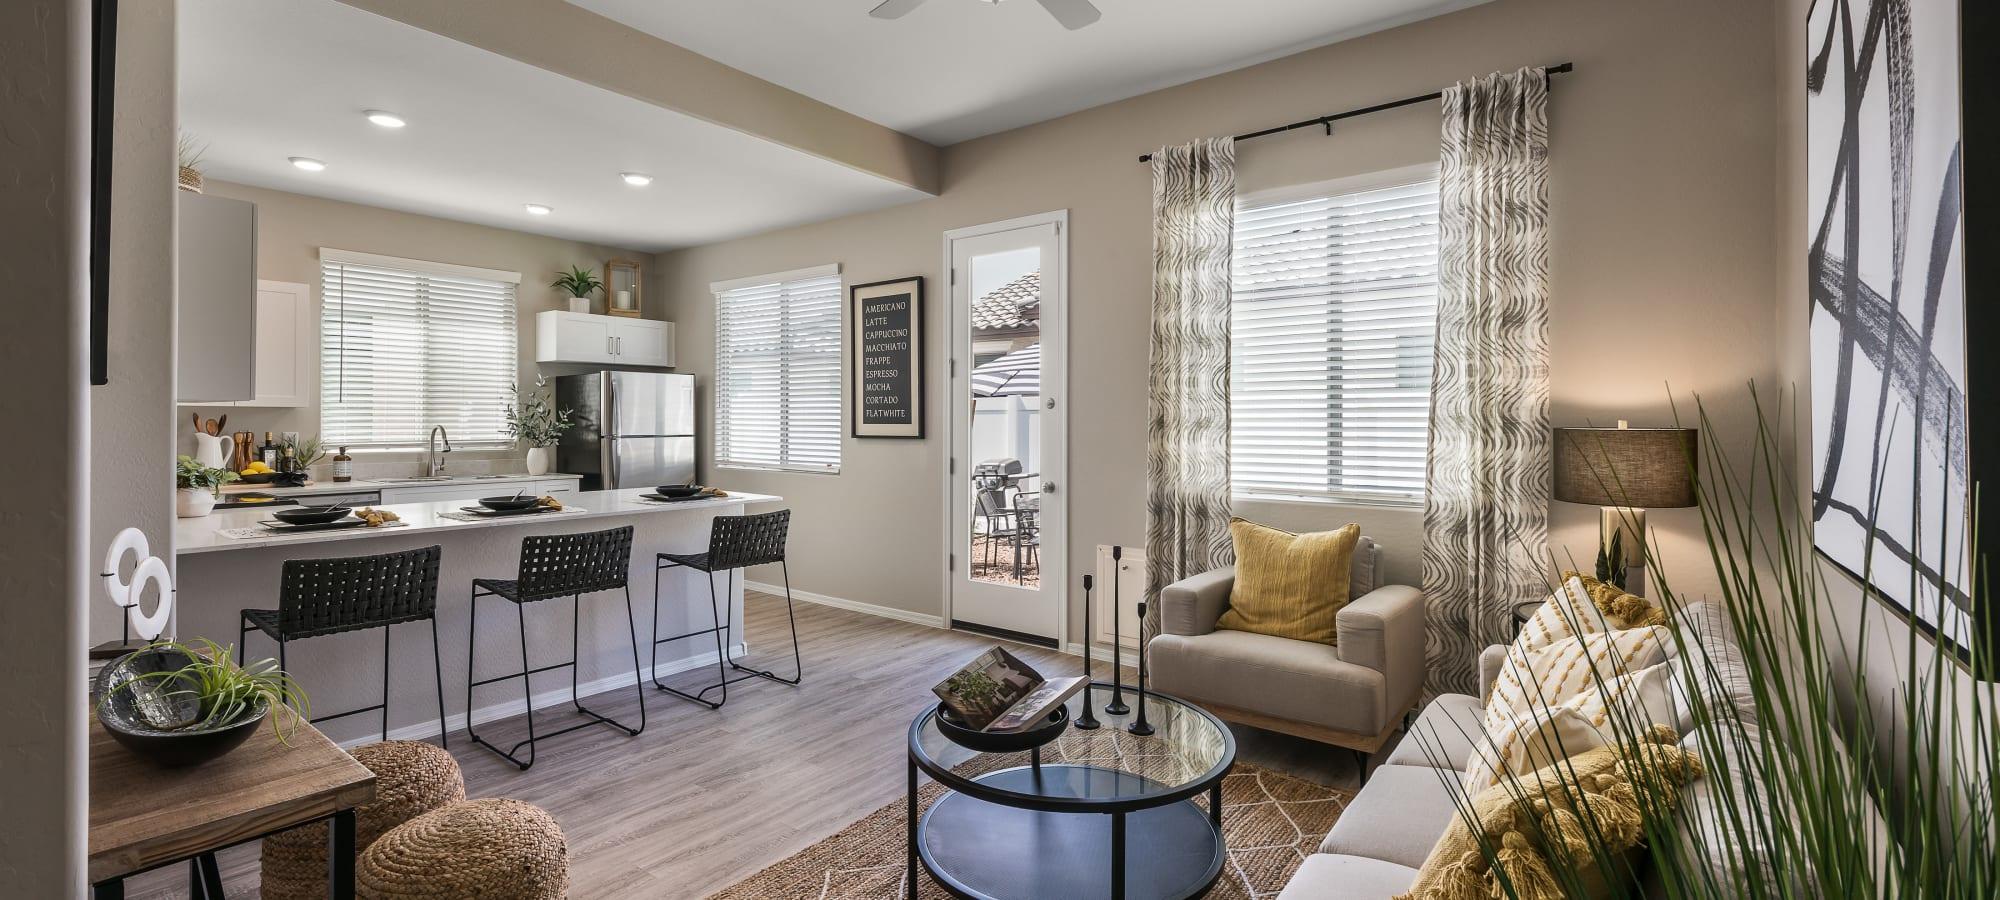 Lavish living room at TerraLane at Canyon Trails in Goodyear, Arizona